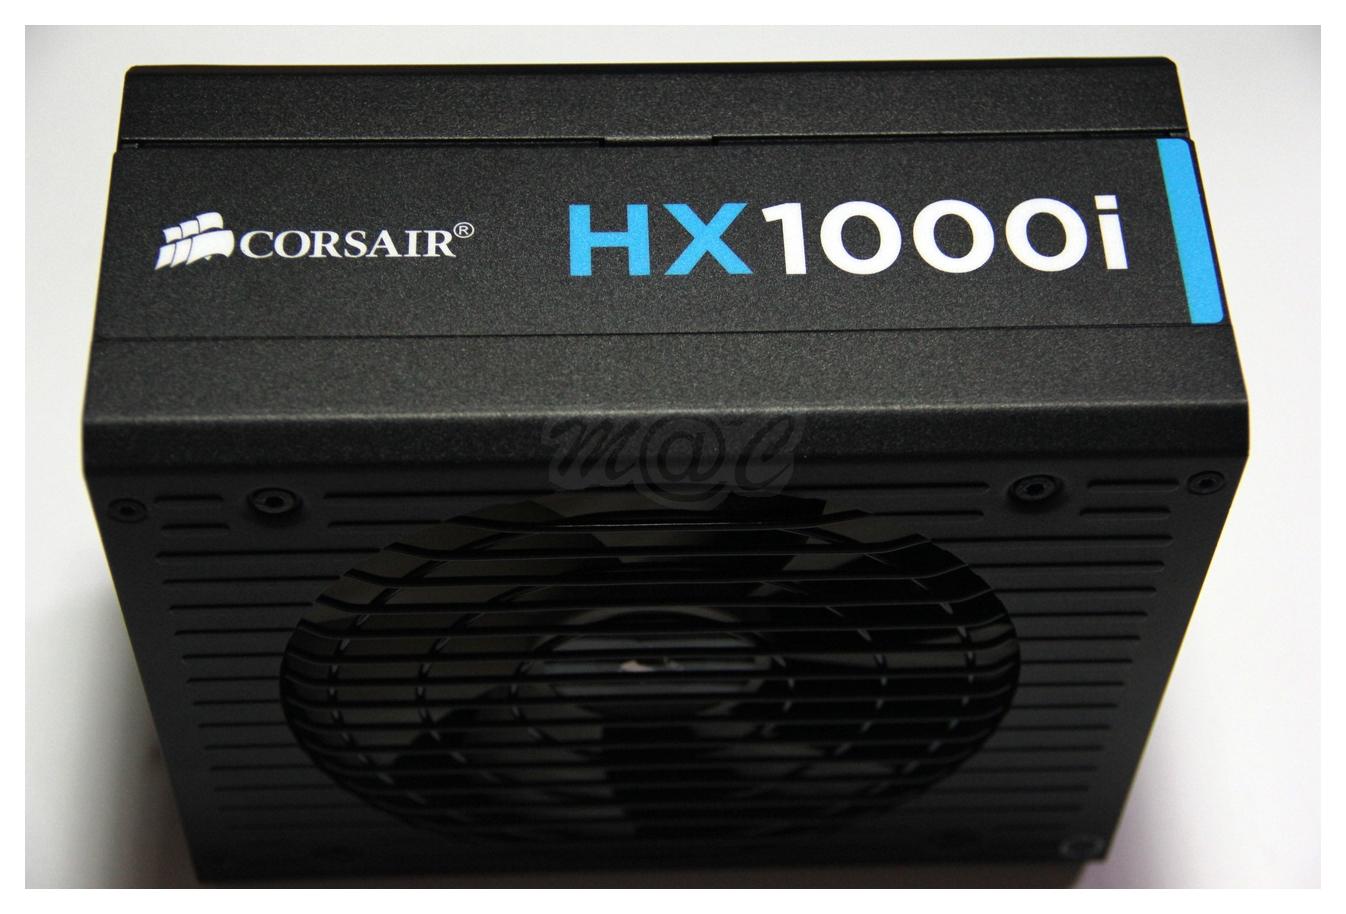 The Corsair HX1000i Platinum Power Supply - A Photo Guide ...